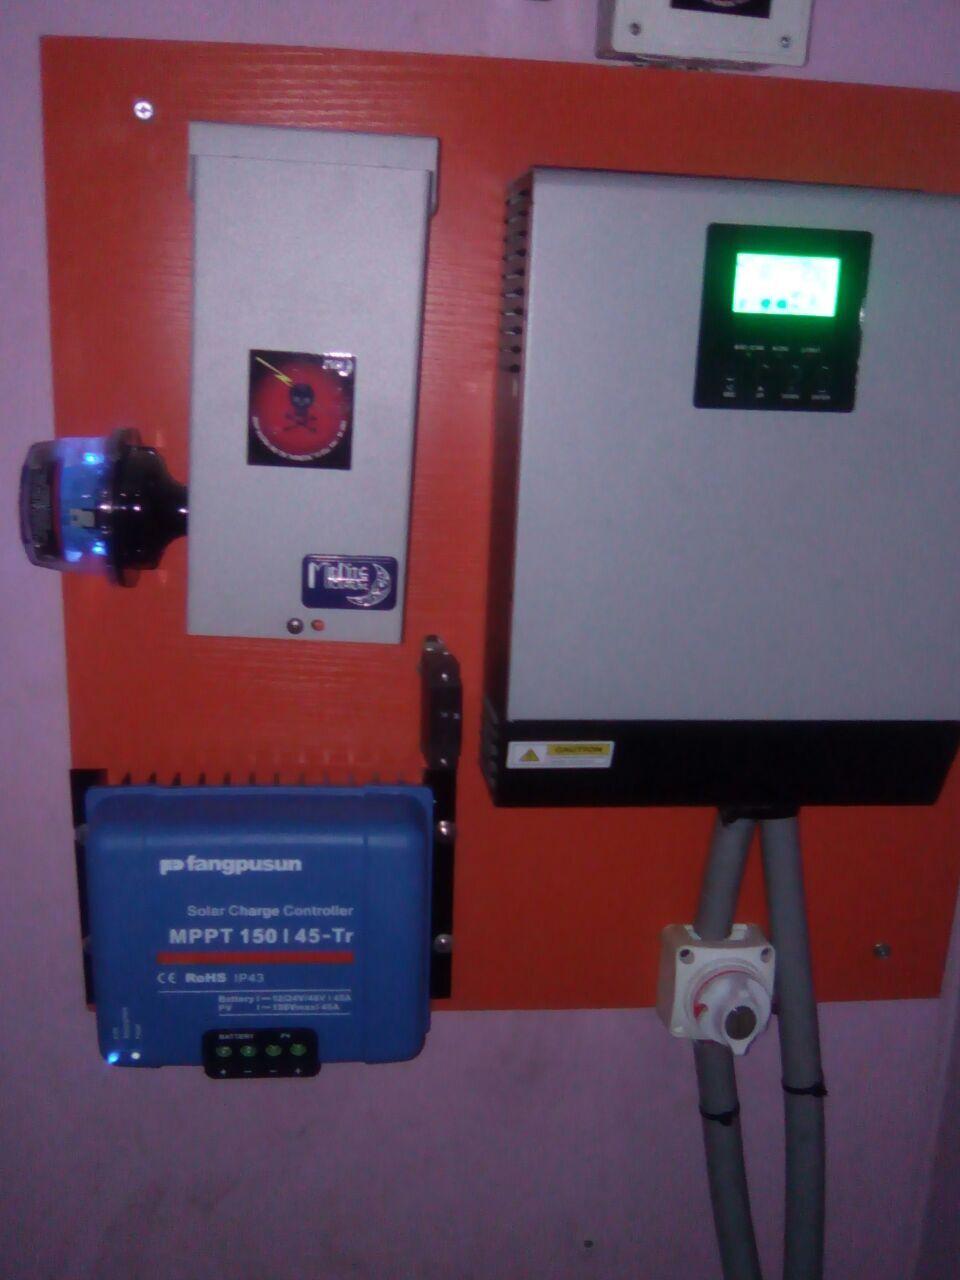 fangpusun MPPT 150/45 solar charge controller